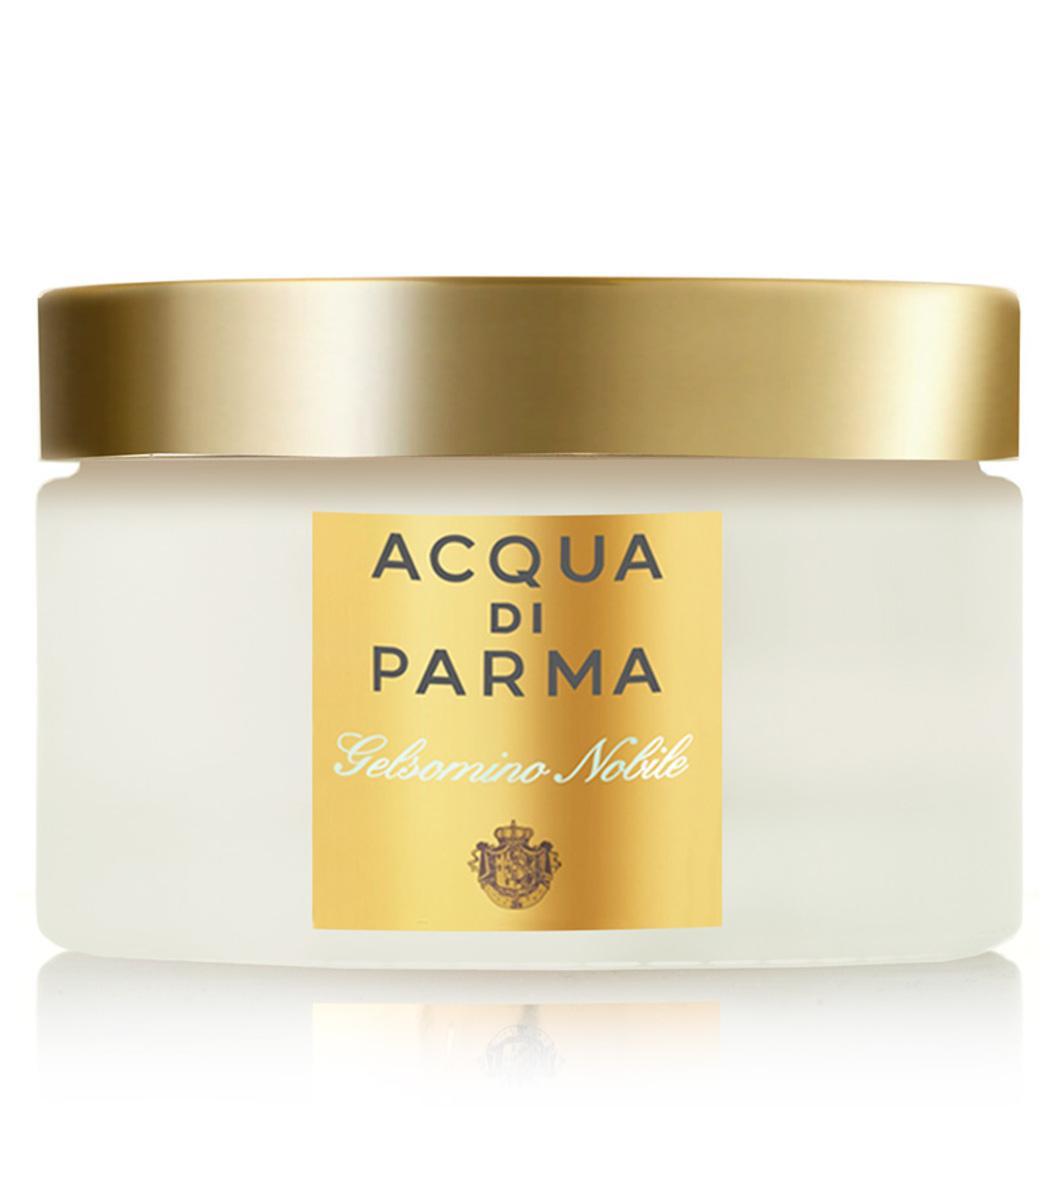 Acqua Di Parma Gelsomino Nobile Radiant Body Cream In N/a